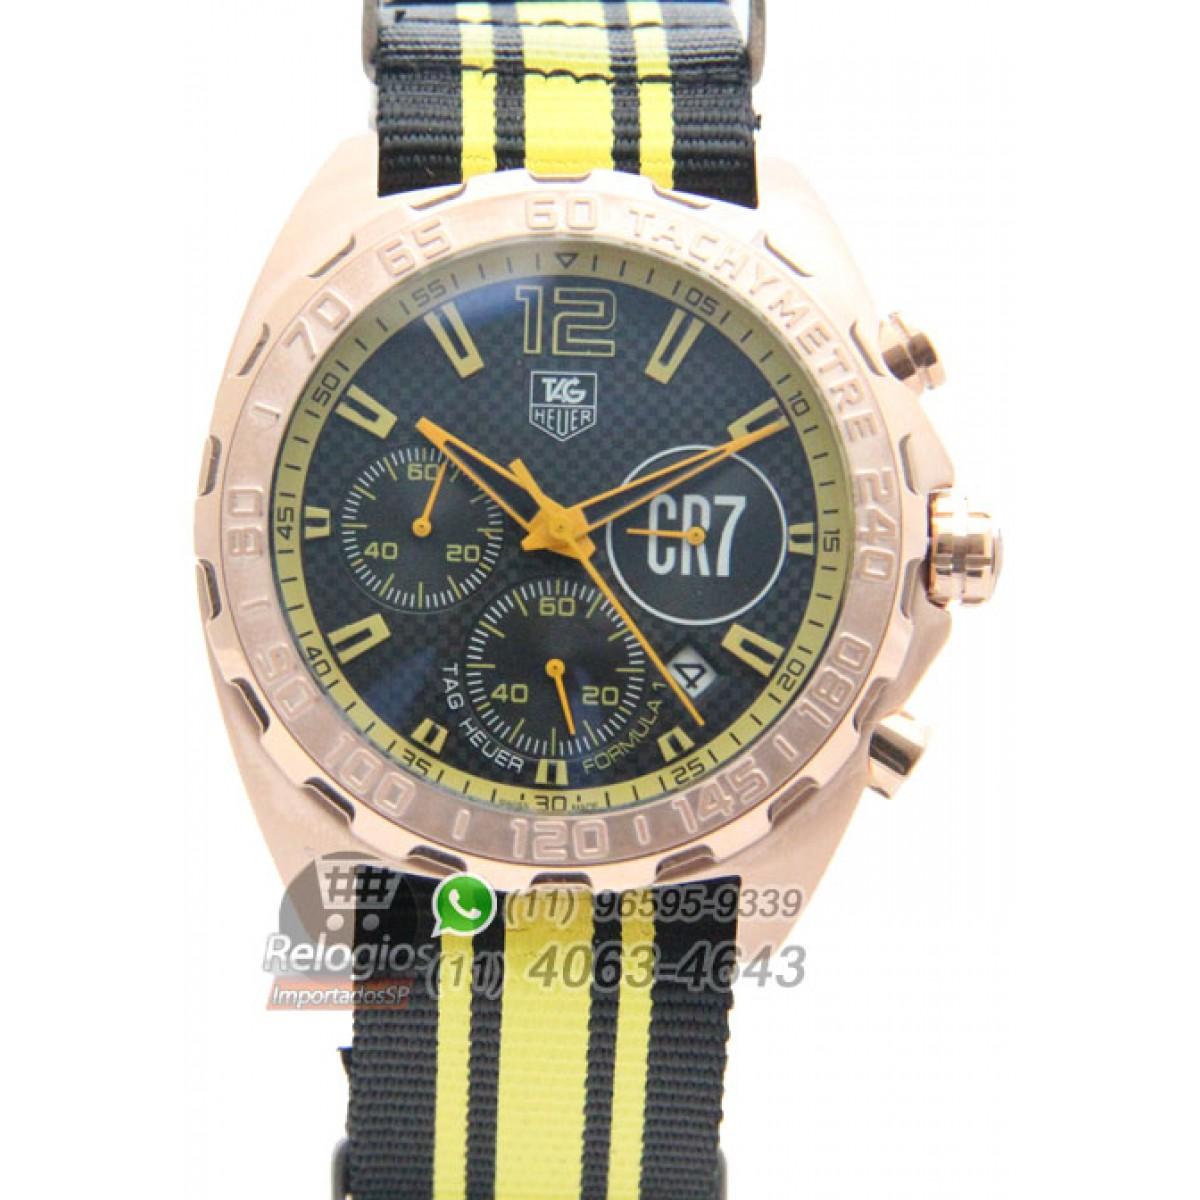 8cc351fb4b9 Relógio Réplica Tag Heuer Formula 1 Cr7